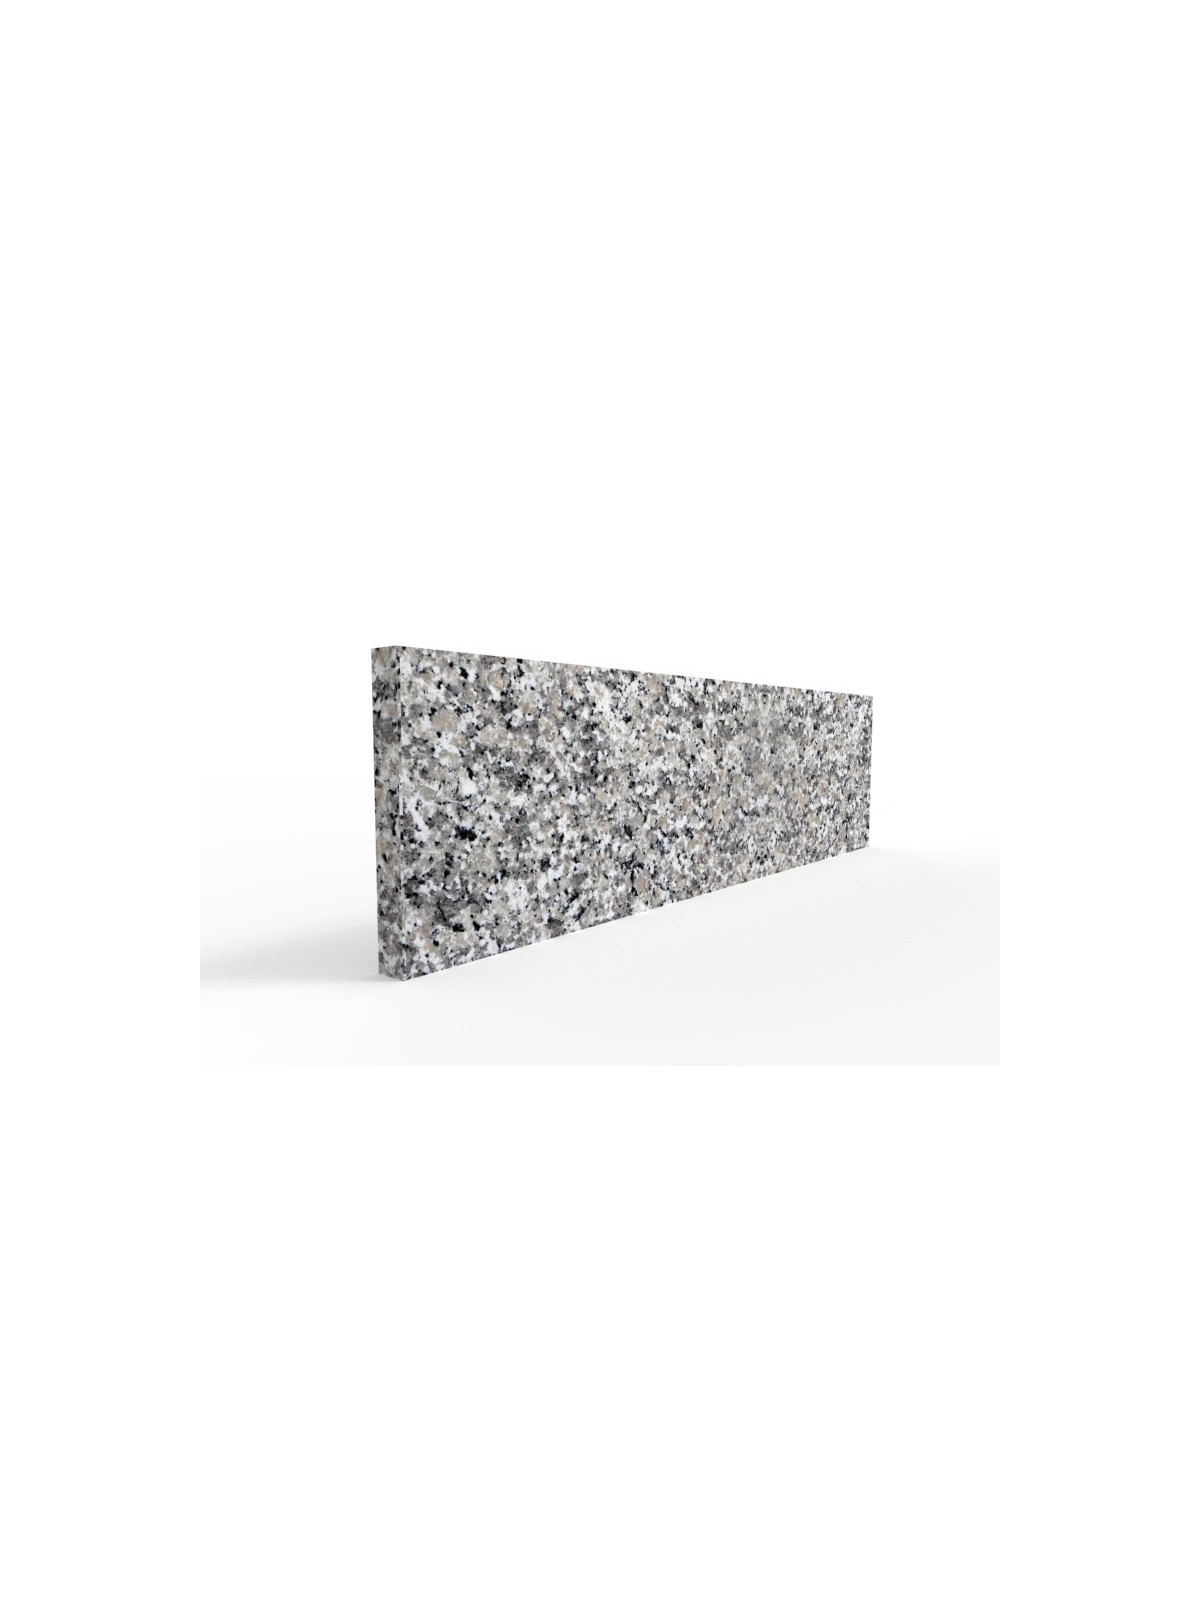 Granit Sockelleiste I Bianco Sardo